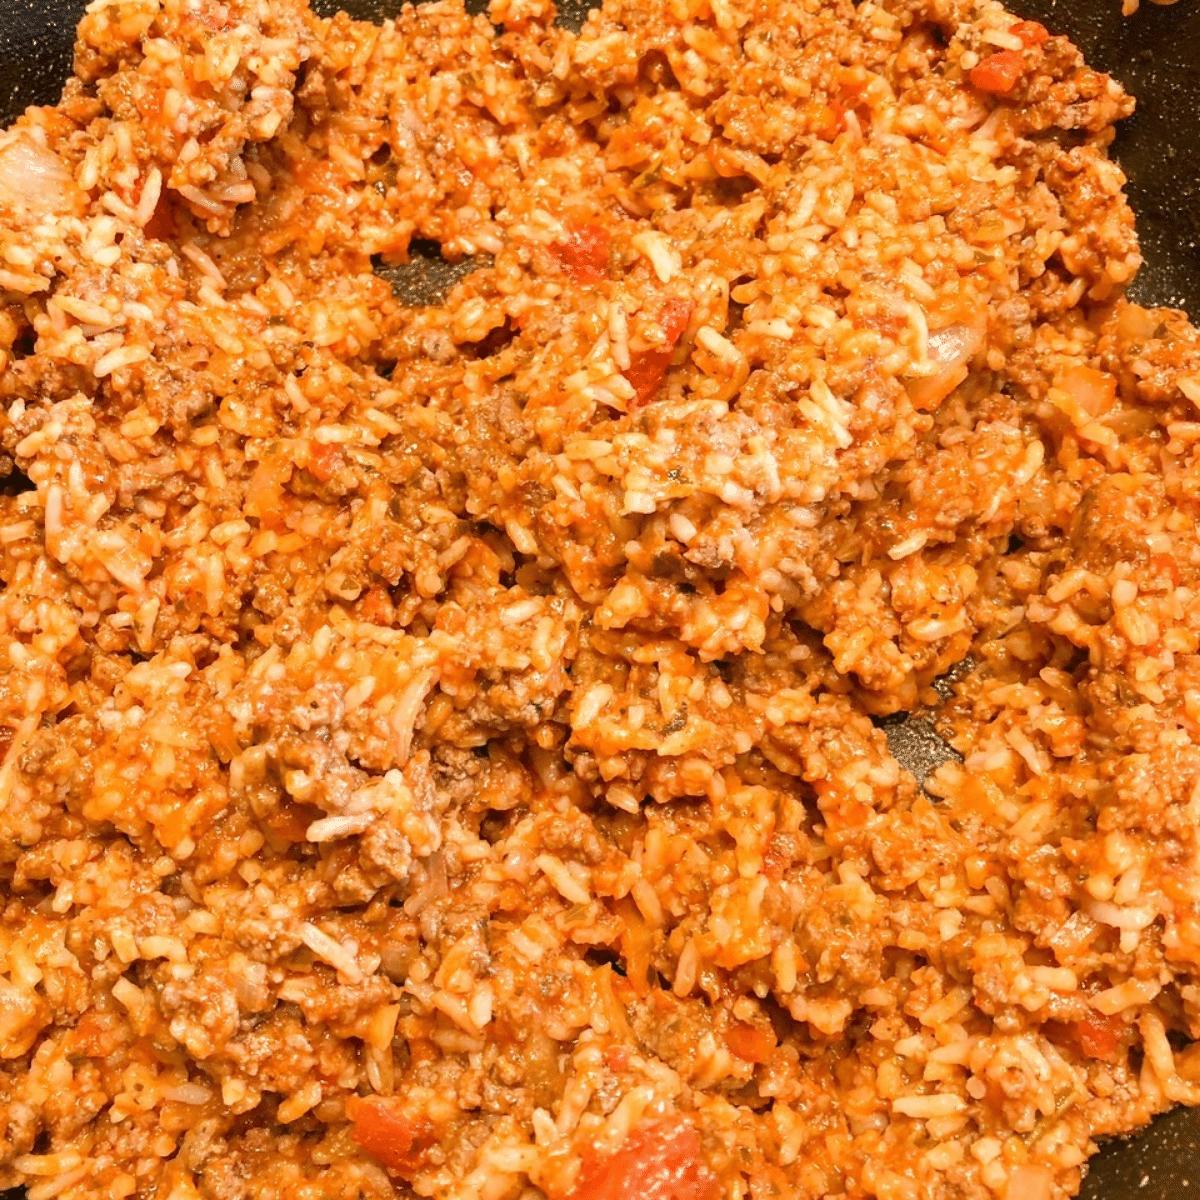 Mix marinara sauce with ground beef and rice